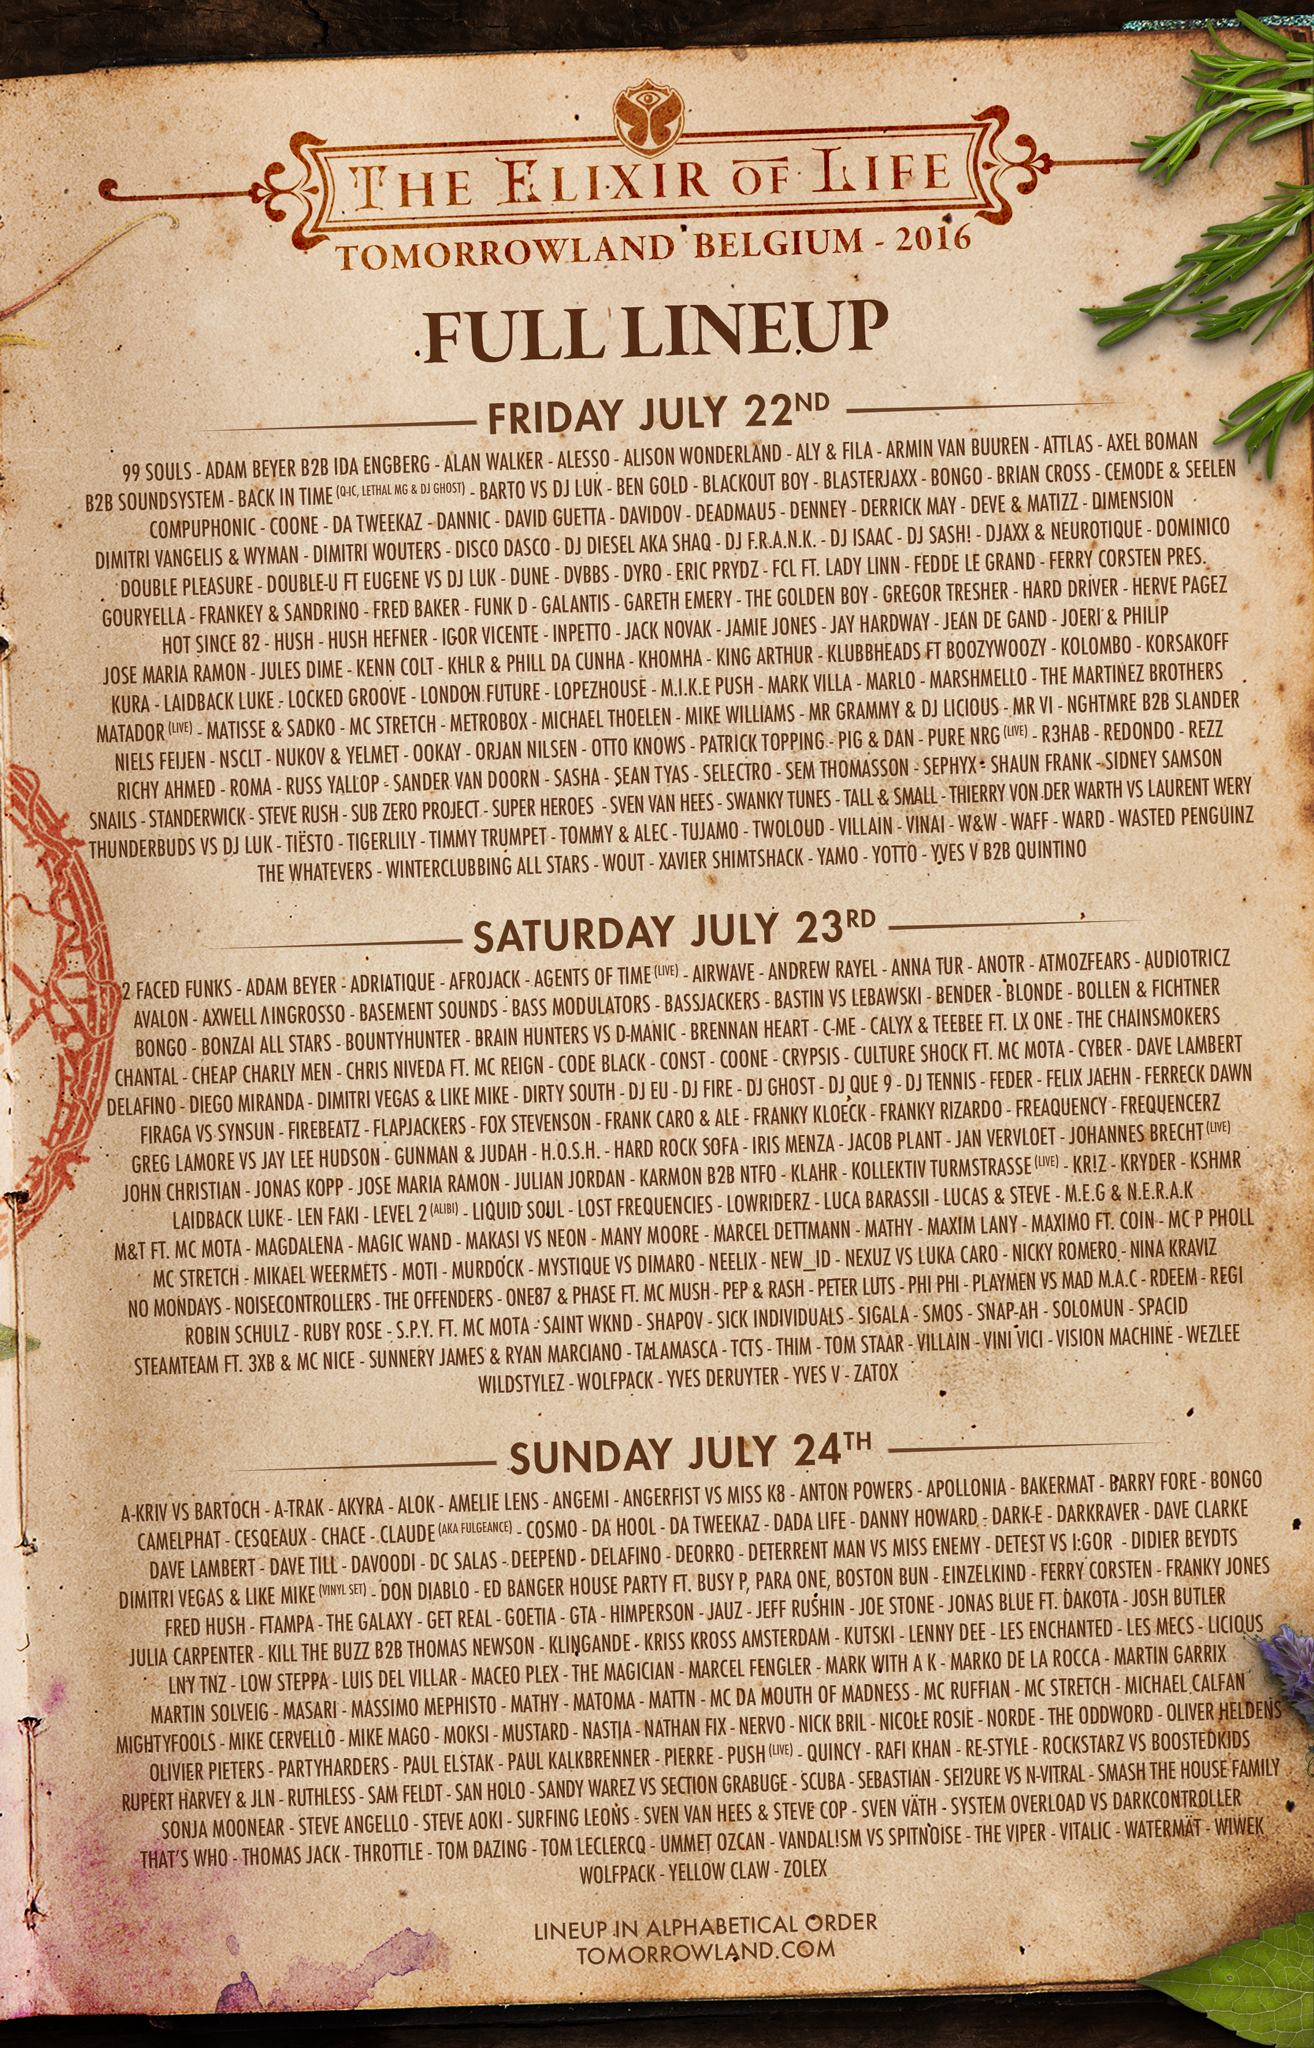 Tomorrowland 2016 full lineup